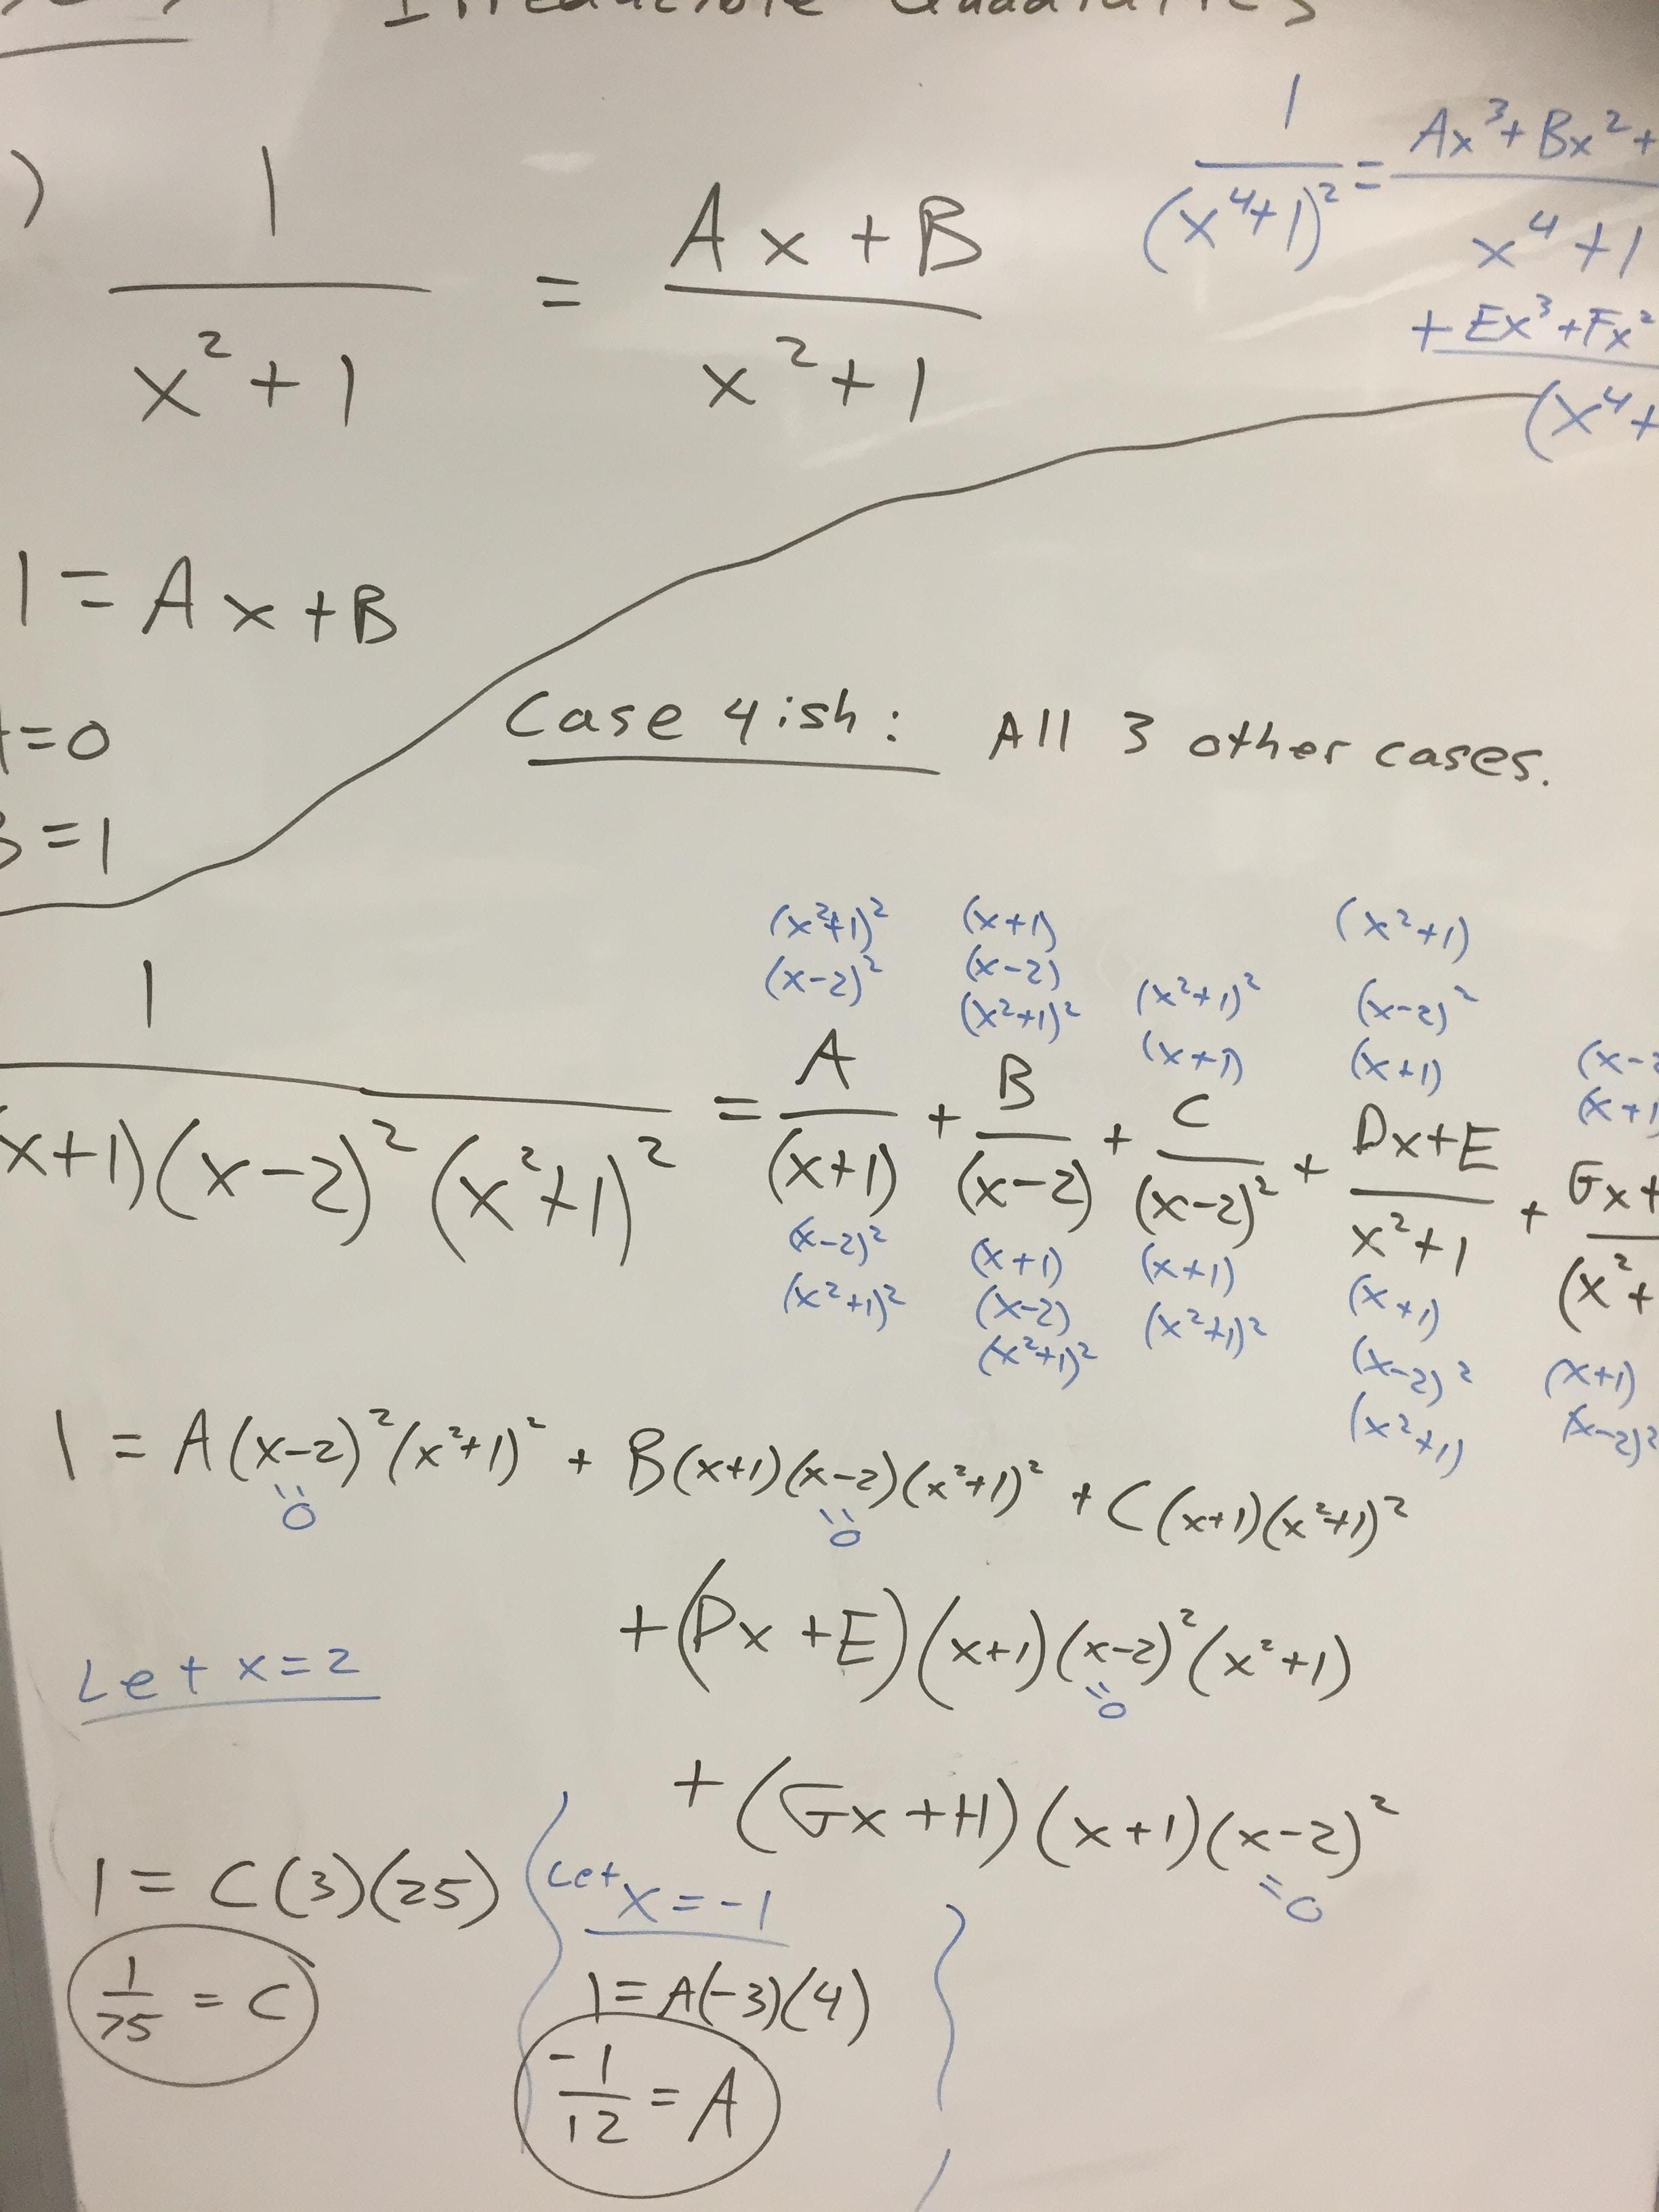 Algebra equations on a whiteboard.